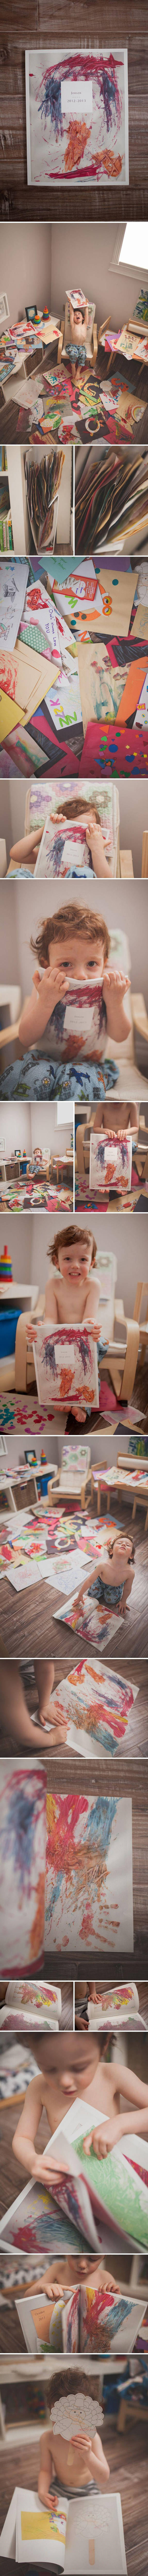 Artifact Uprising | Toddler Art Book | The Paper Deer Photography | paperdeerphoto.com